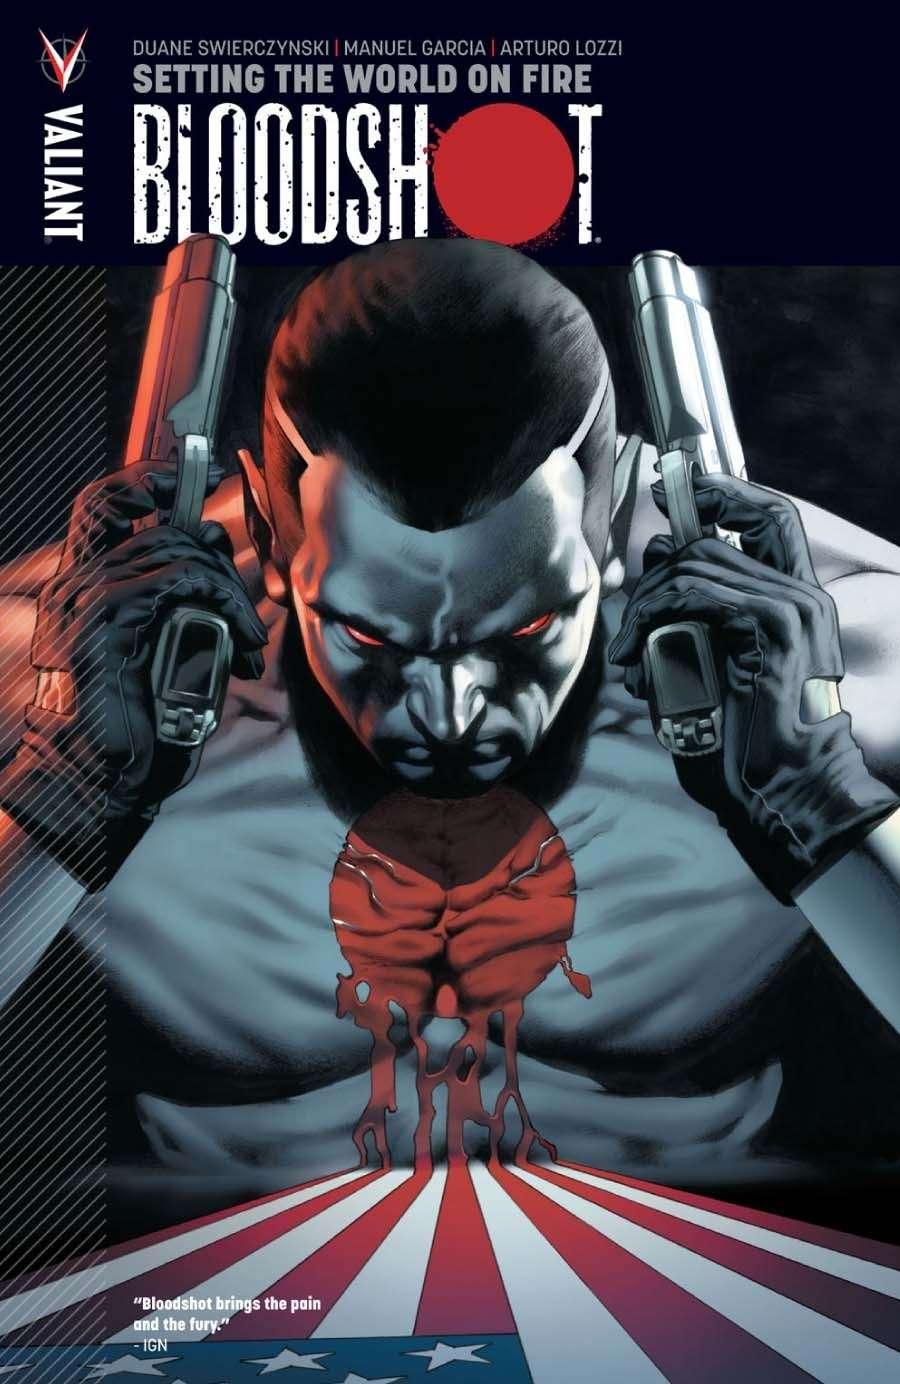 Bloodshot Volume 1: Setting the World on Fire - Valiant Comics   Bloodshot    DriveThruRPG com